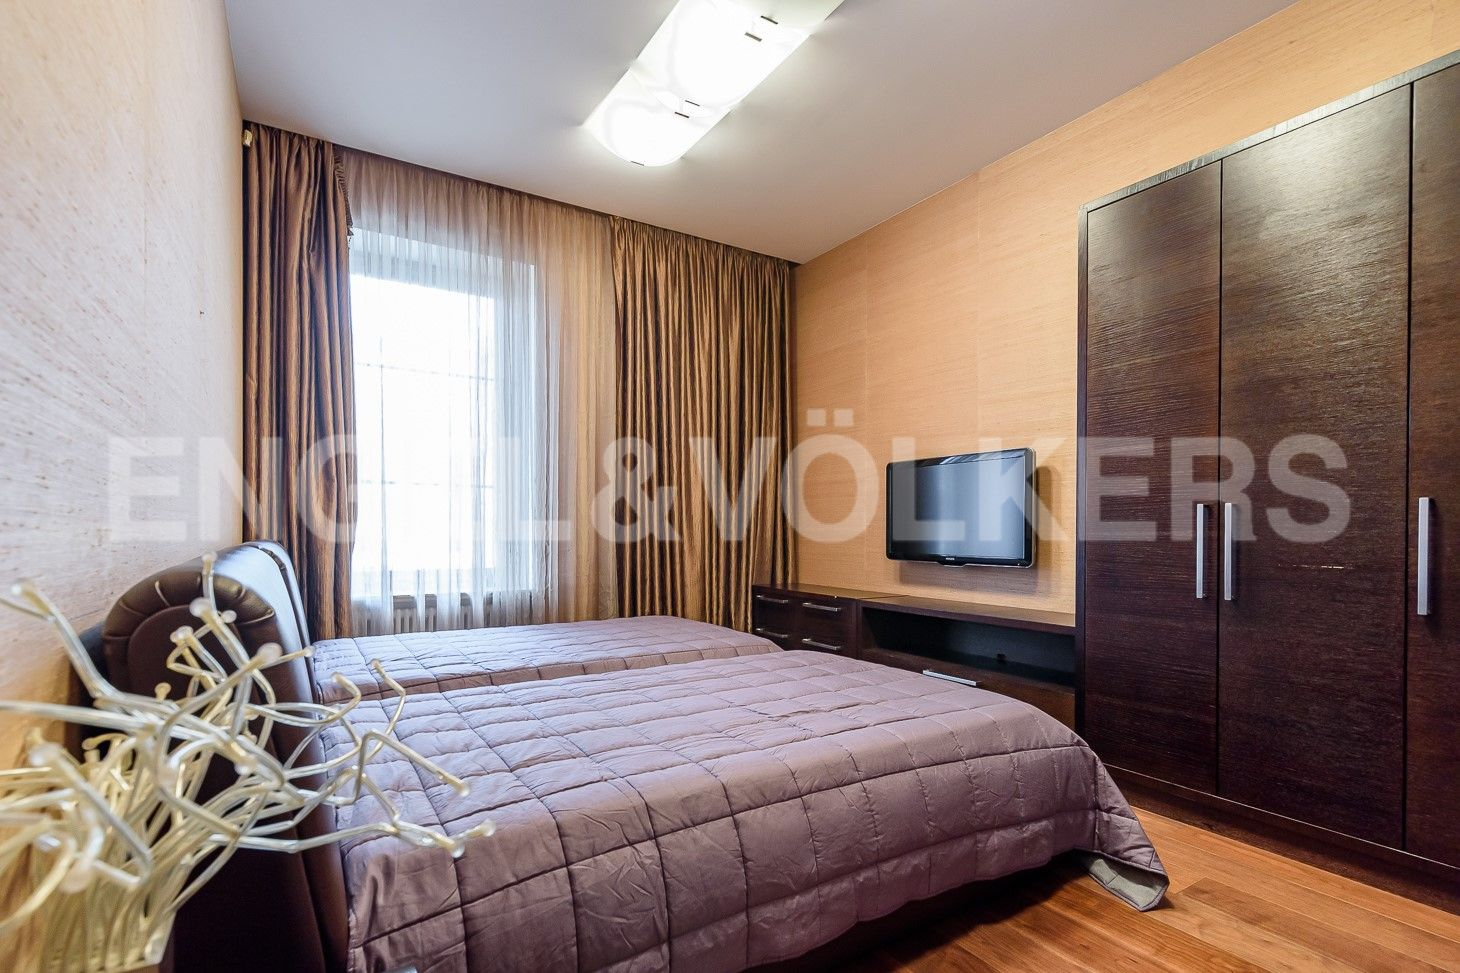 Элитные квартиры на . Санкт-Петербург, наб. Мартынова, 74Б. Четвертая спальня